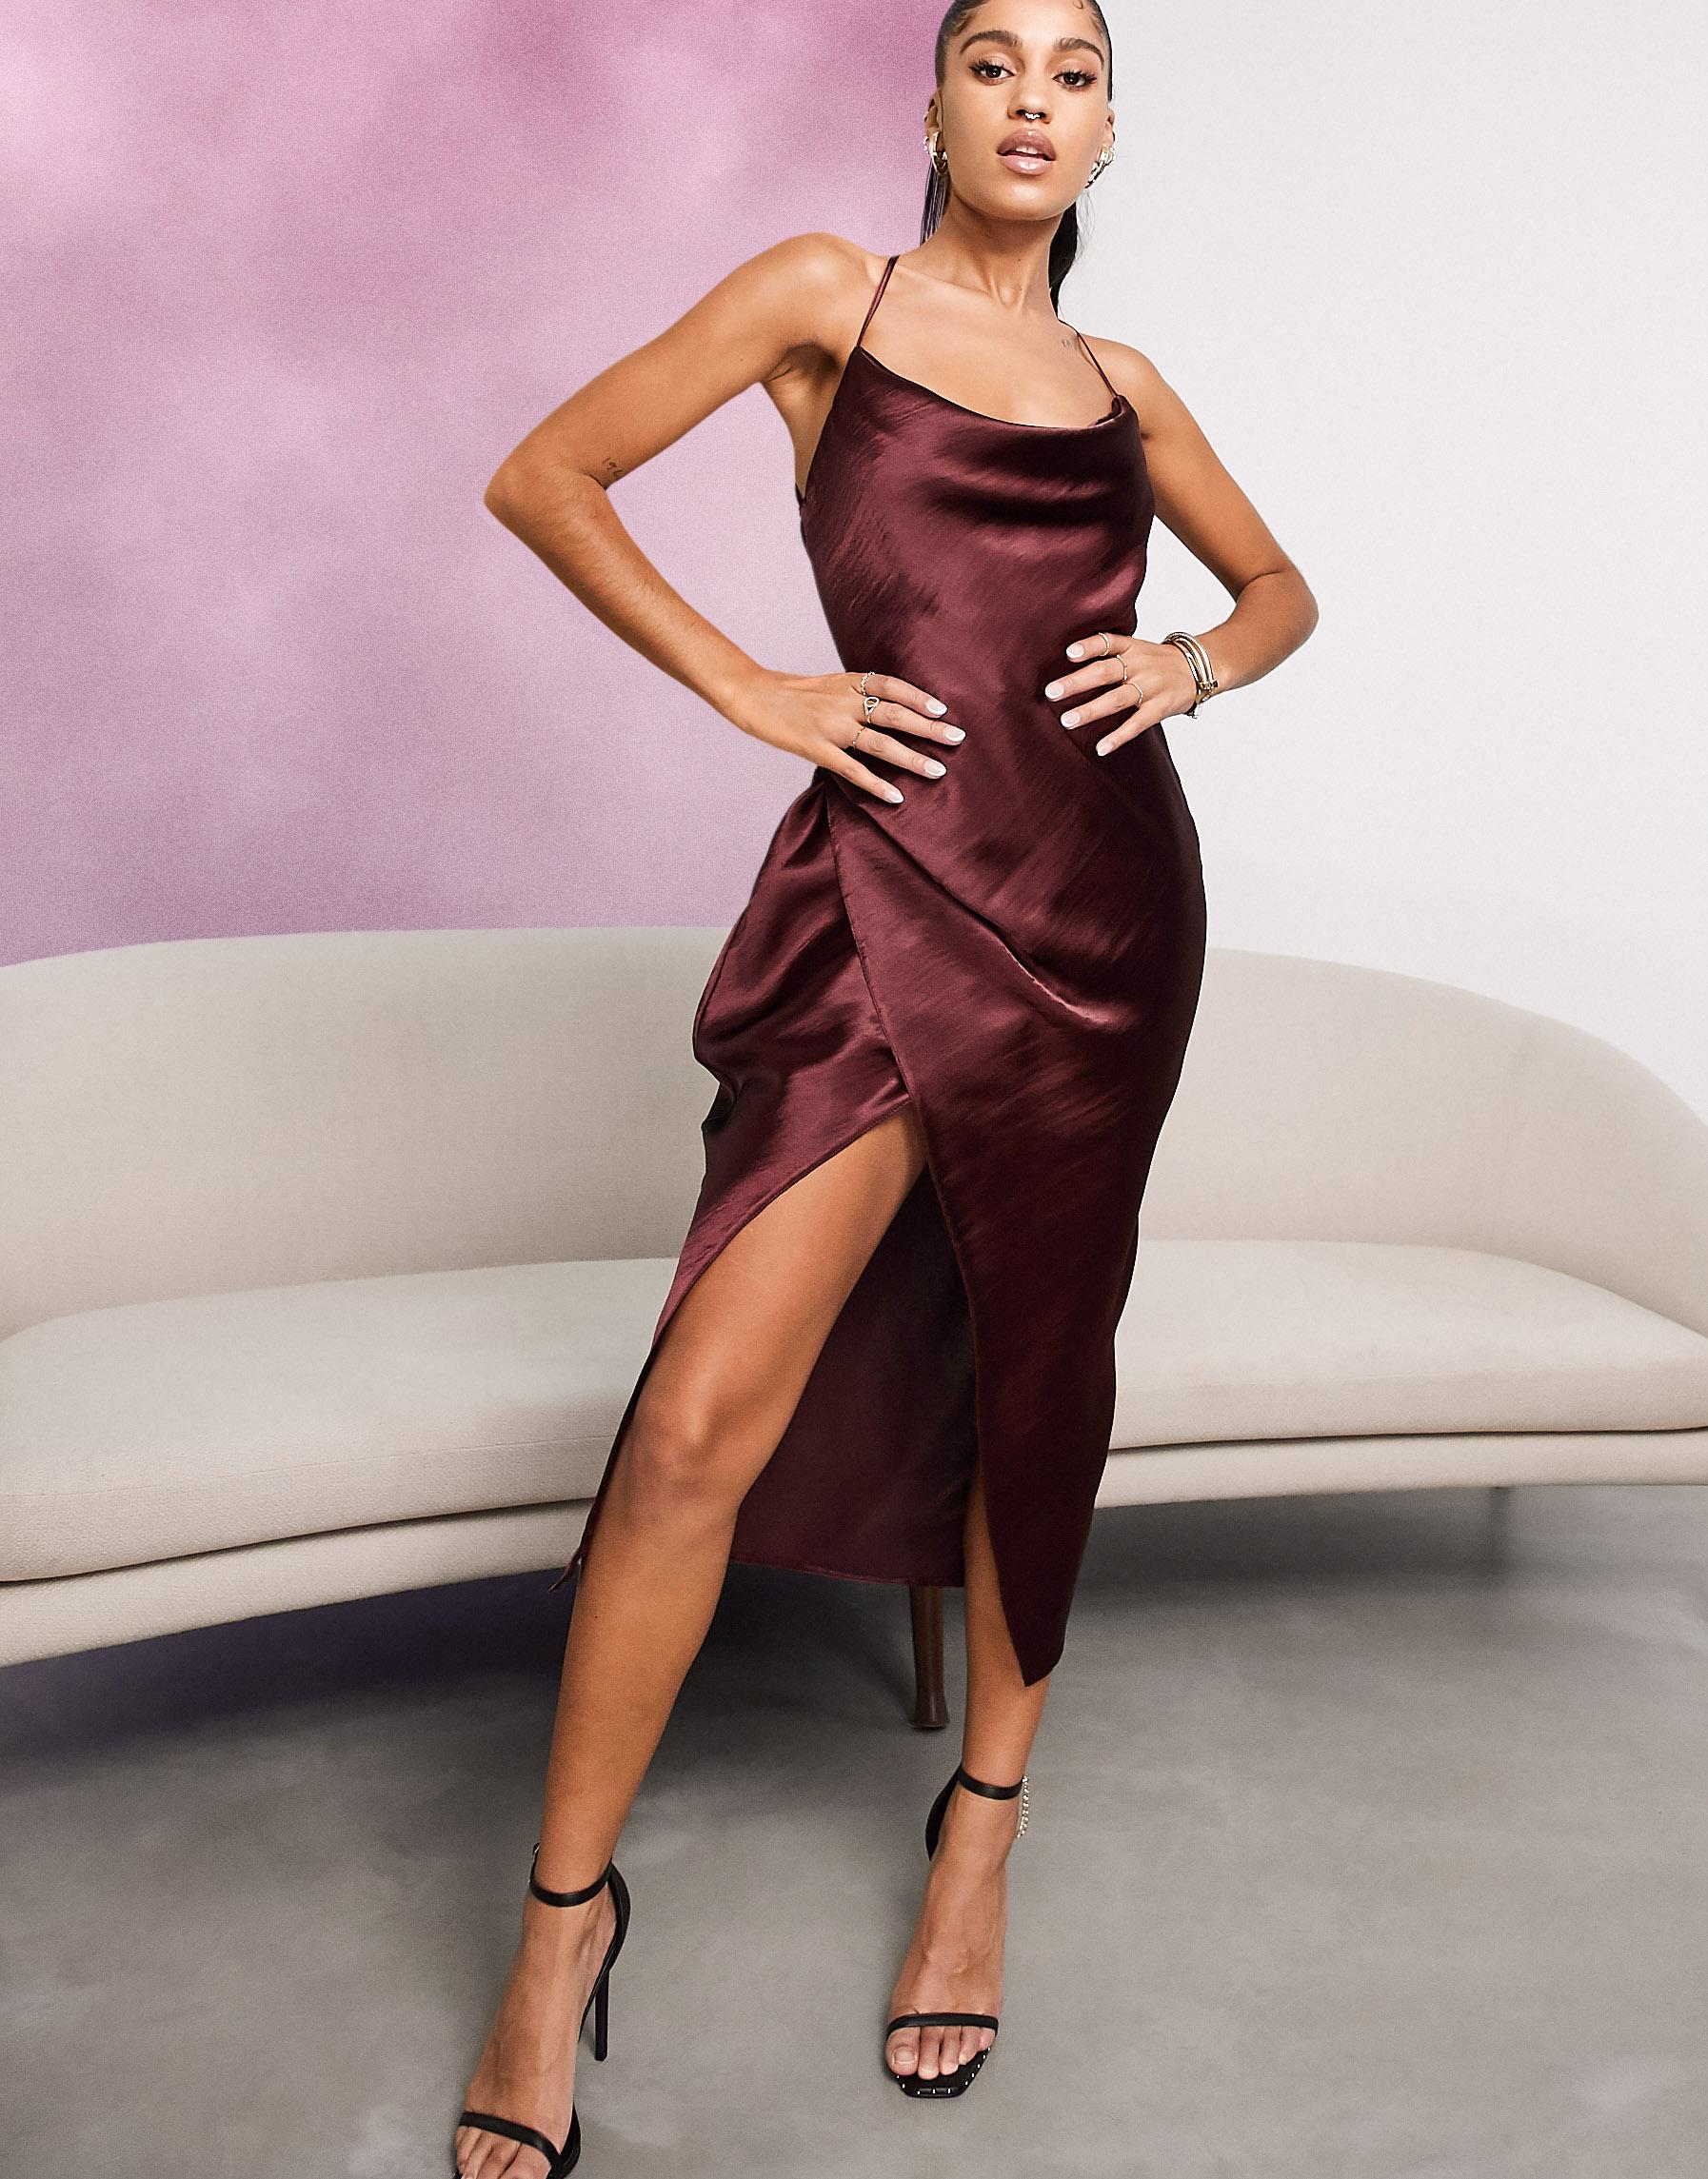 Vestido lencero color vino de tirantes de raso